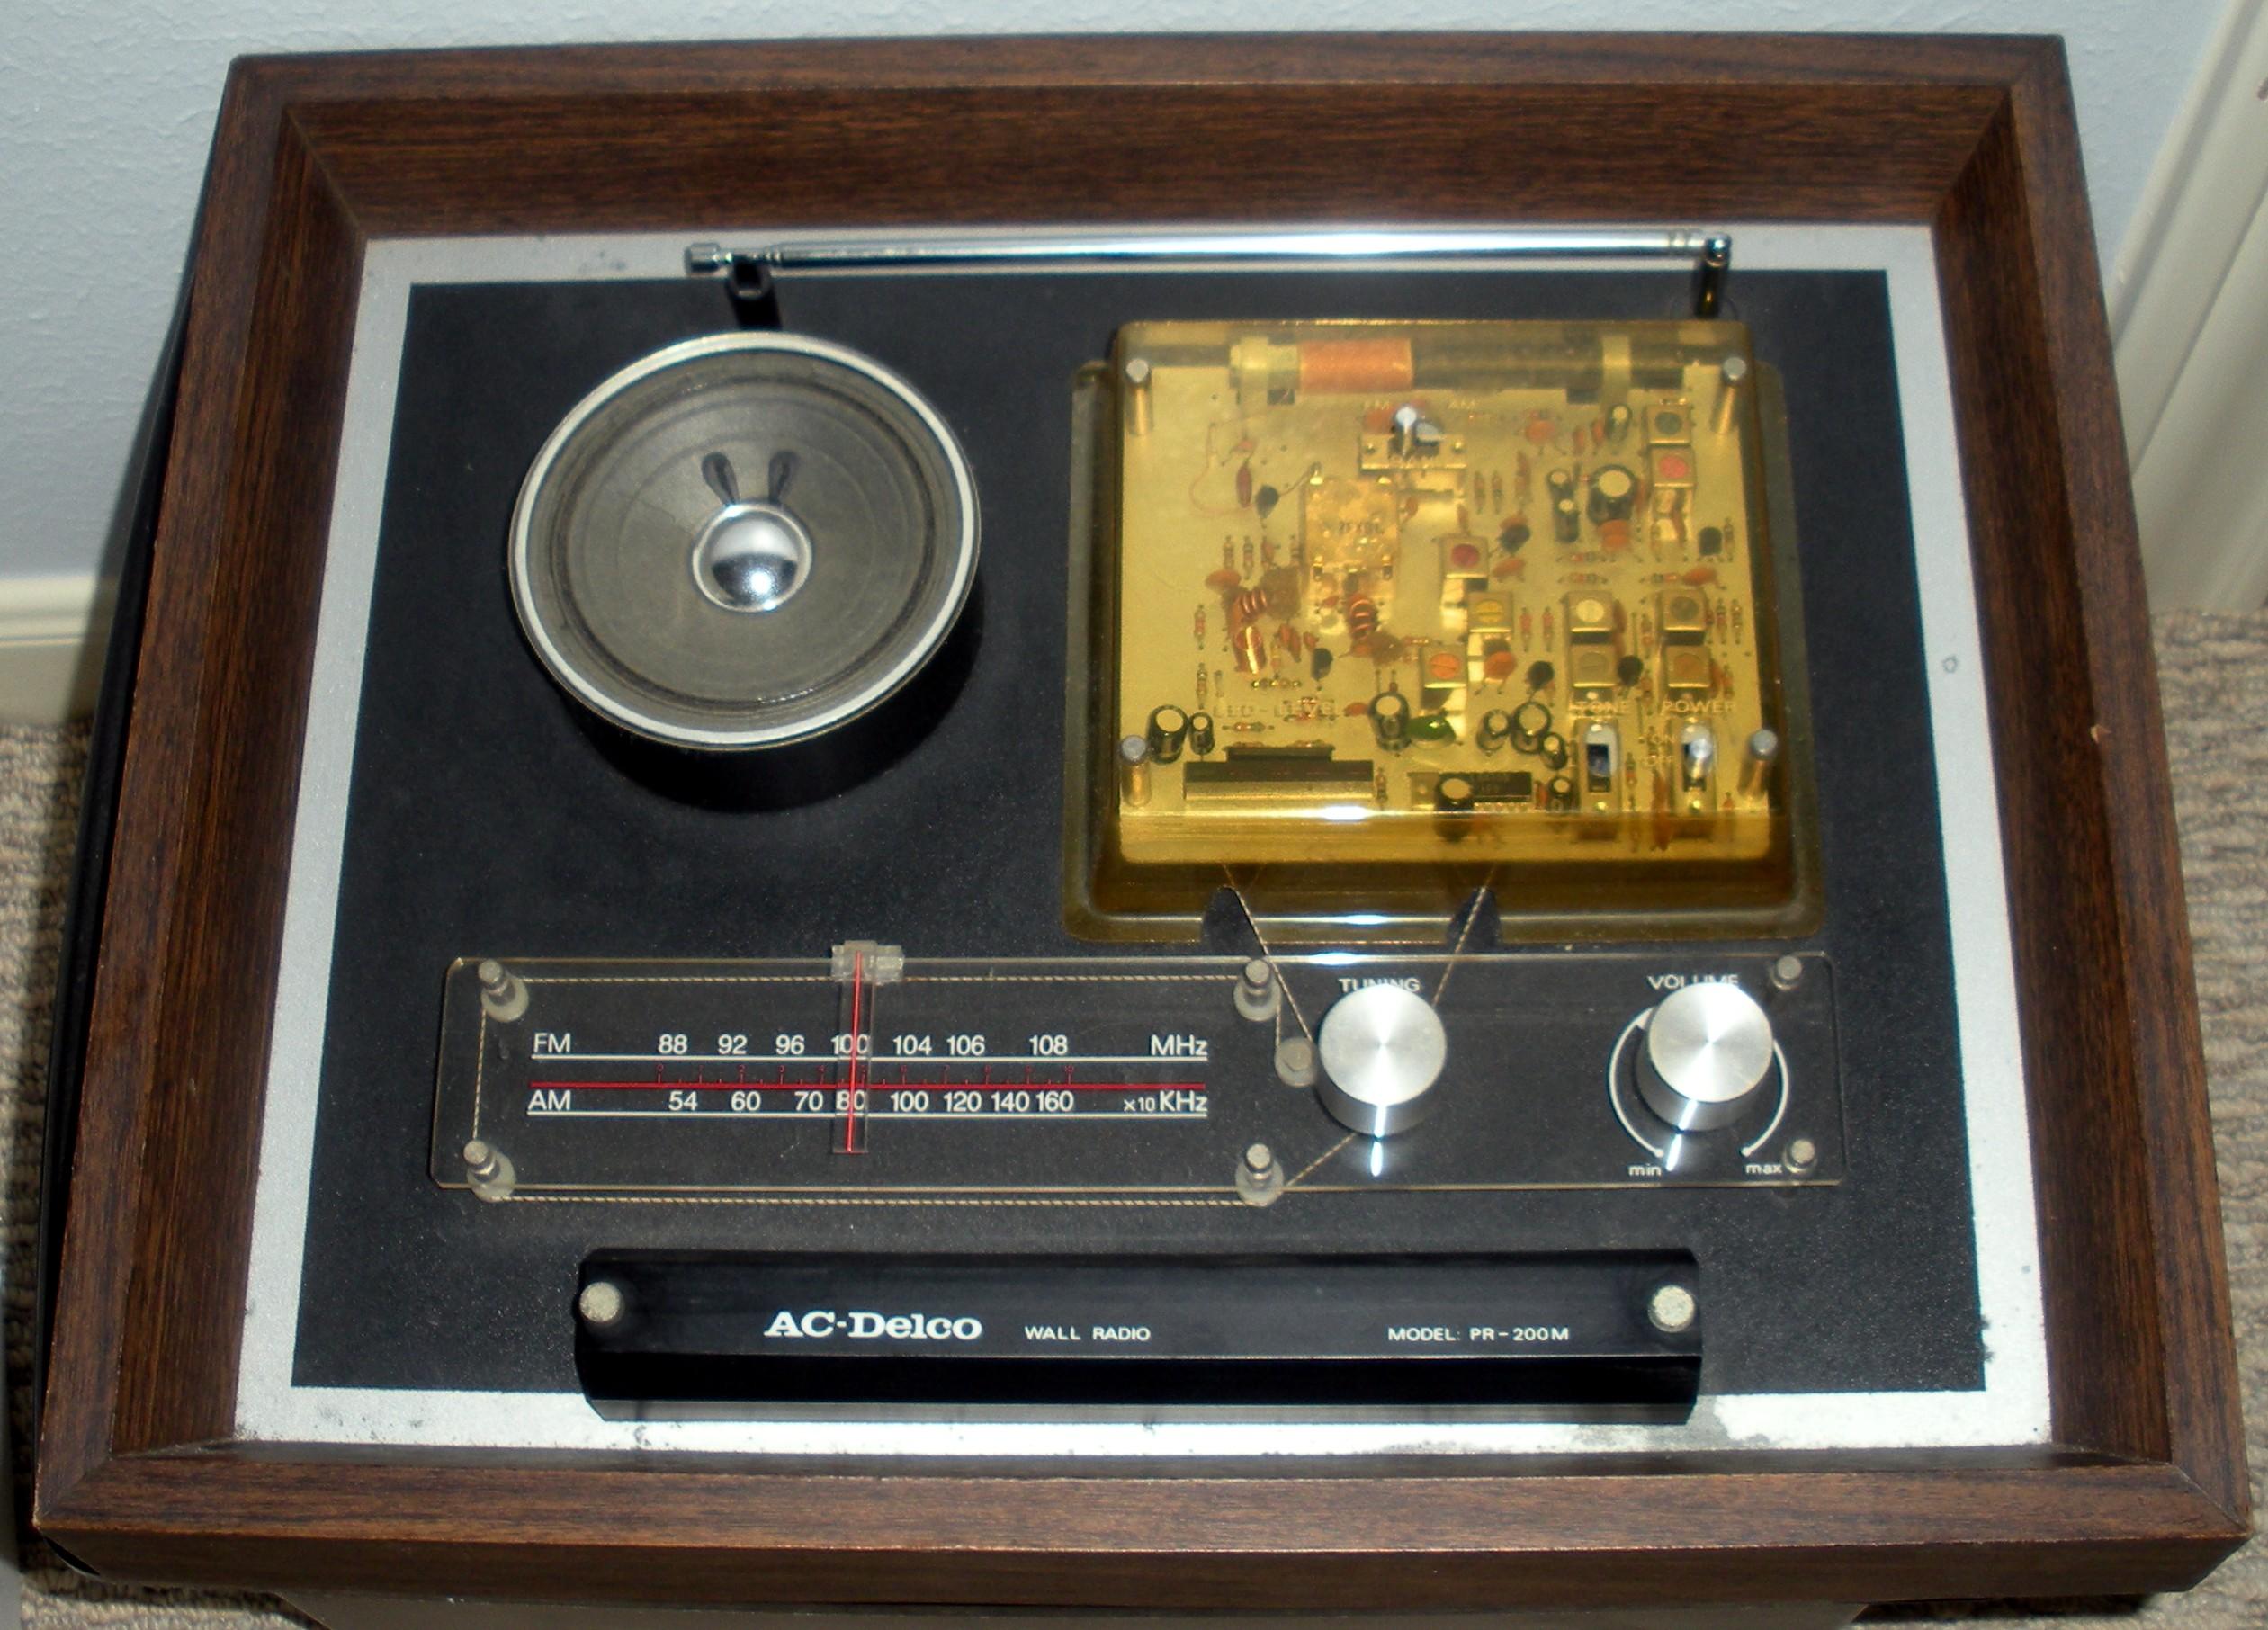 AC Delco Wall Radio PR-200M DSCN9604